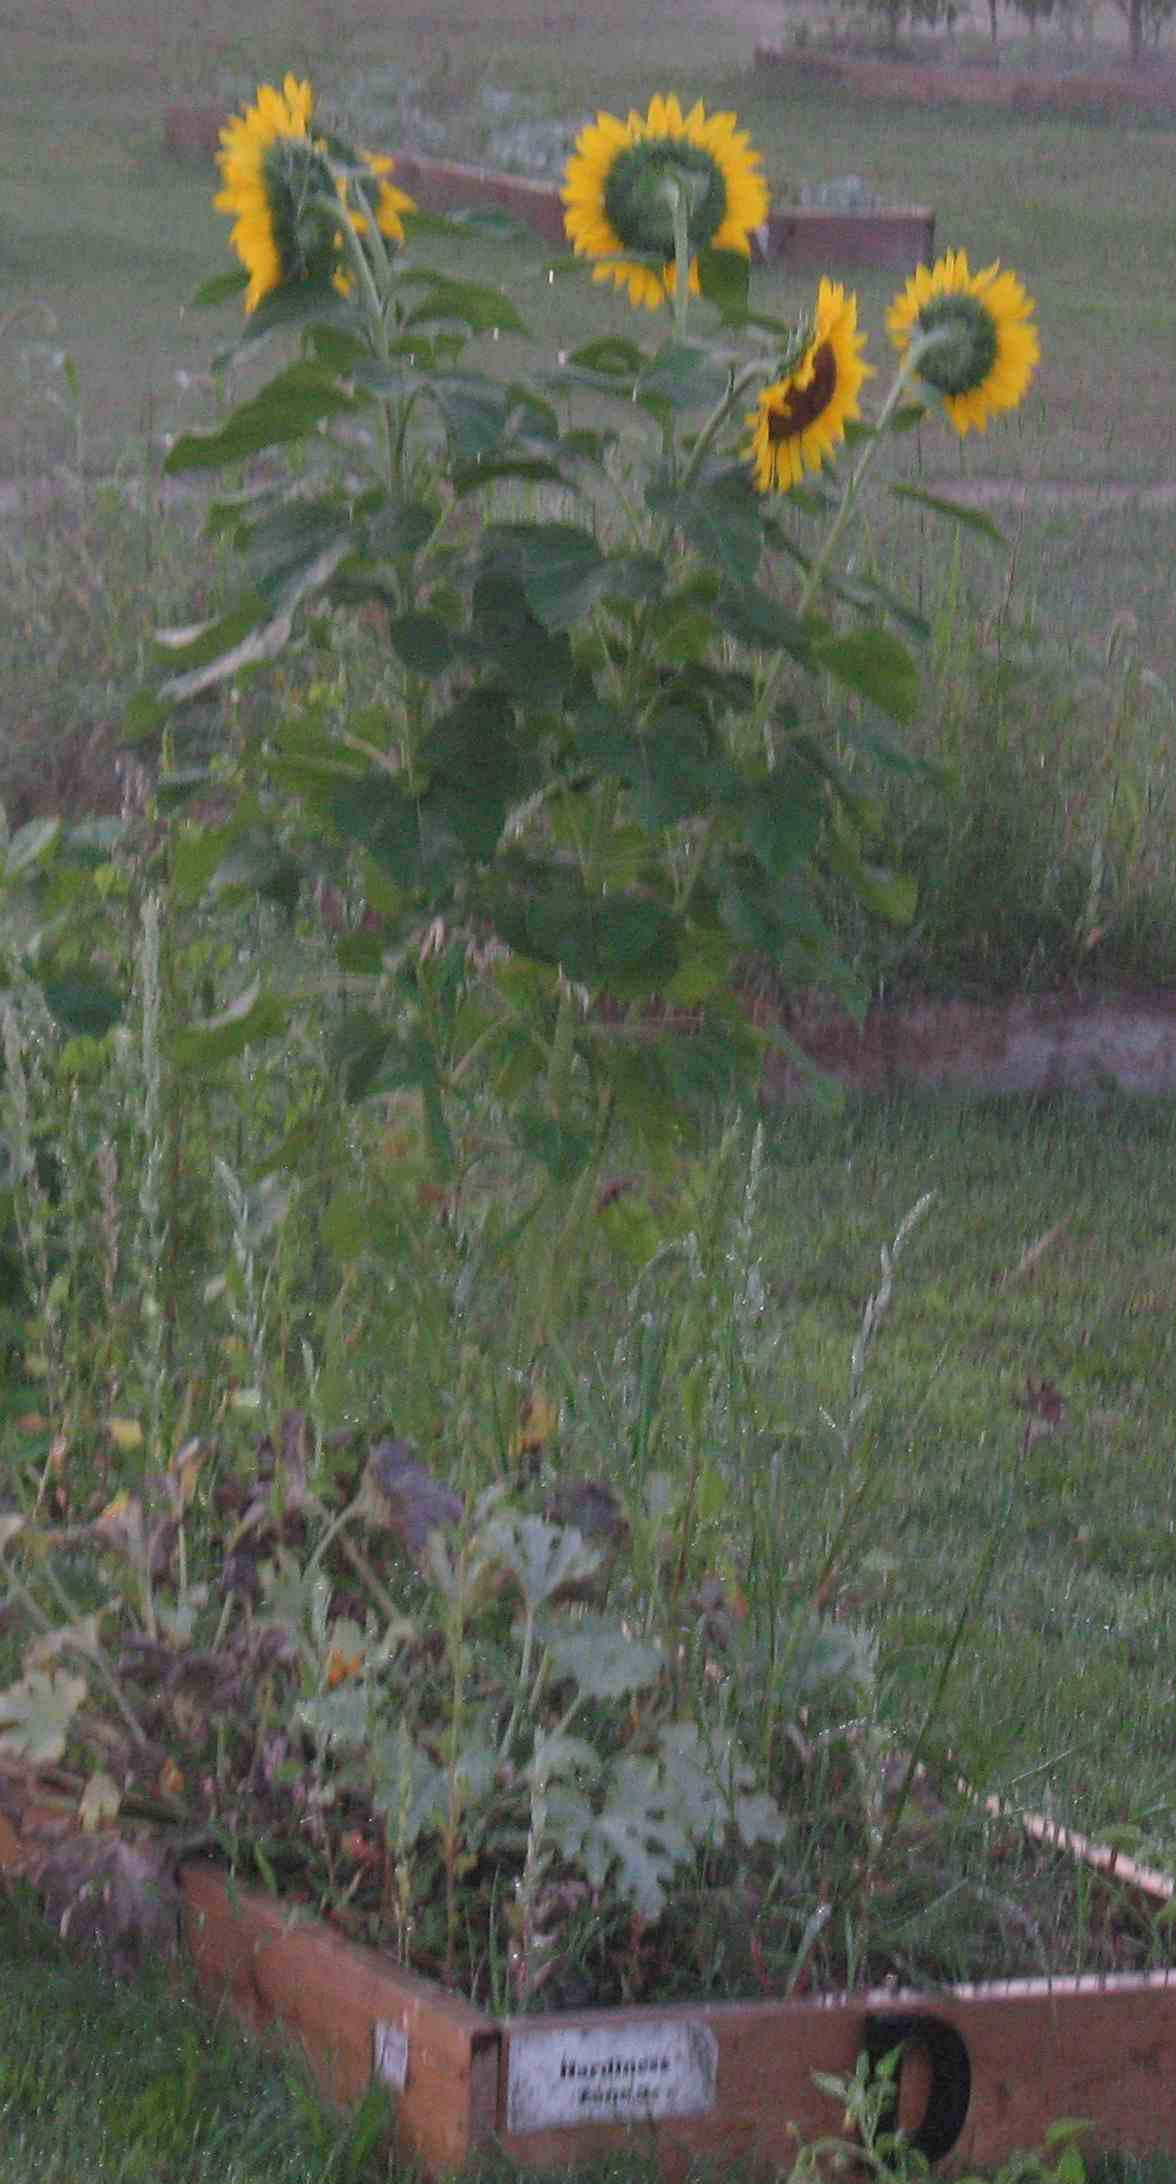 Sunflowers bloom in the center of the Kelloggsville Community Garden